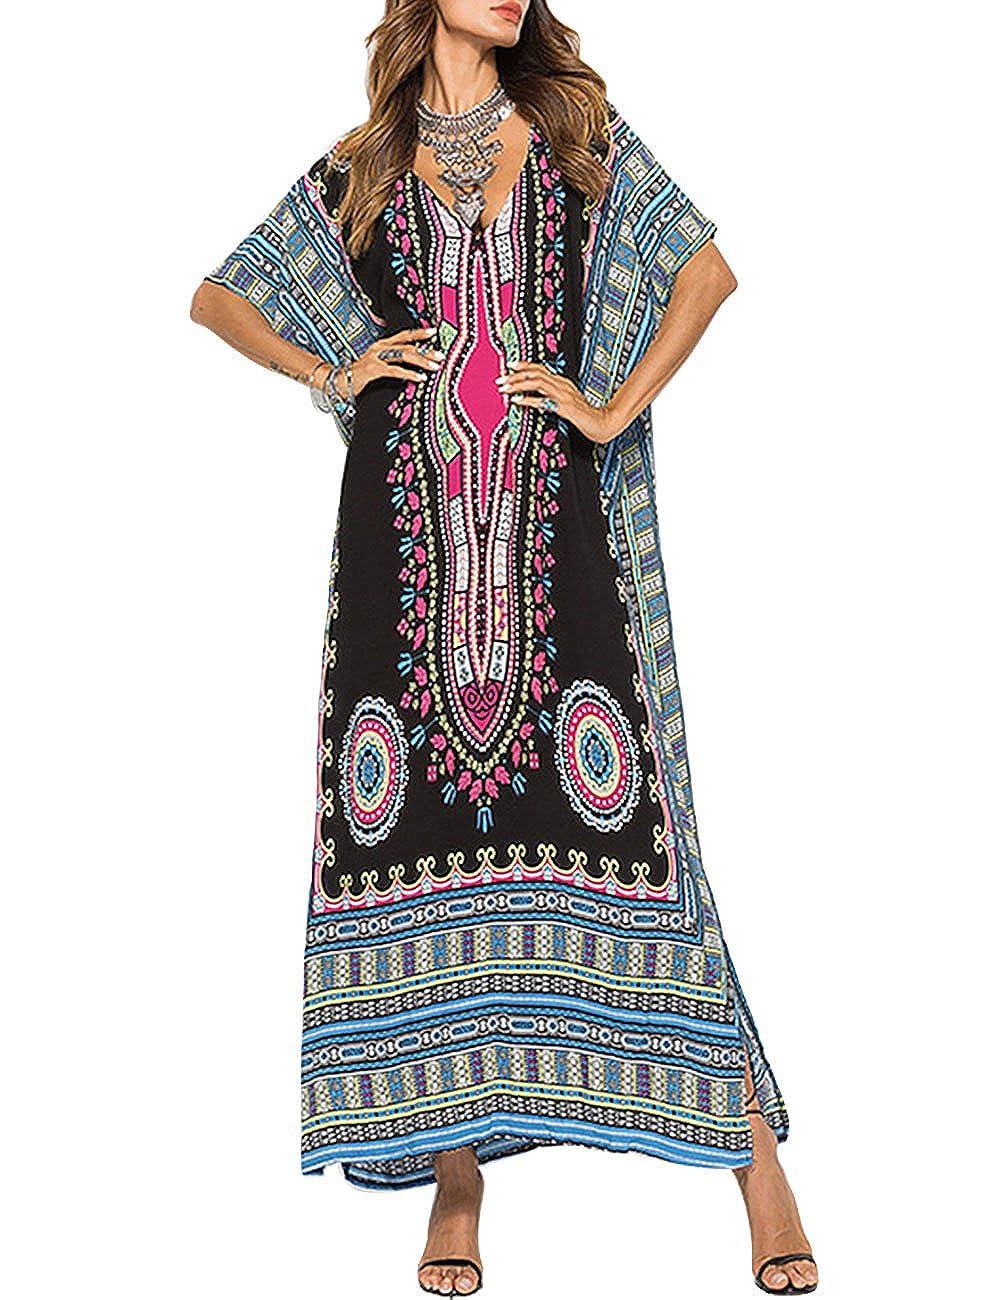 9fa302a387 Buauty Kaftan Tunic Kimono Dress Ladies Summer Women Evening Maxi Party Plus  Size Black at Amazon Women's Clothing store: